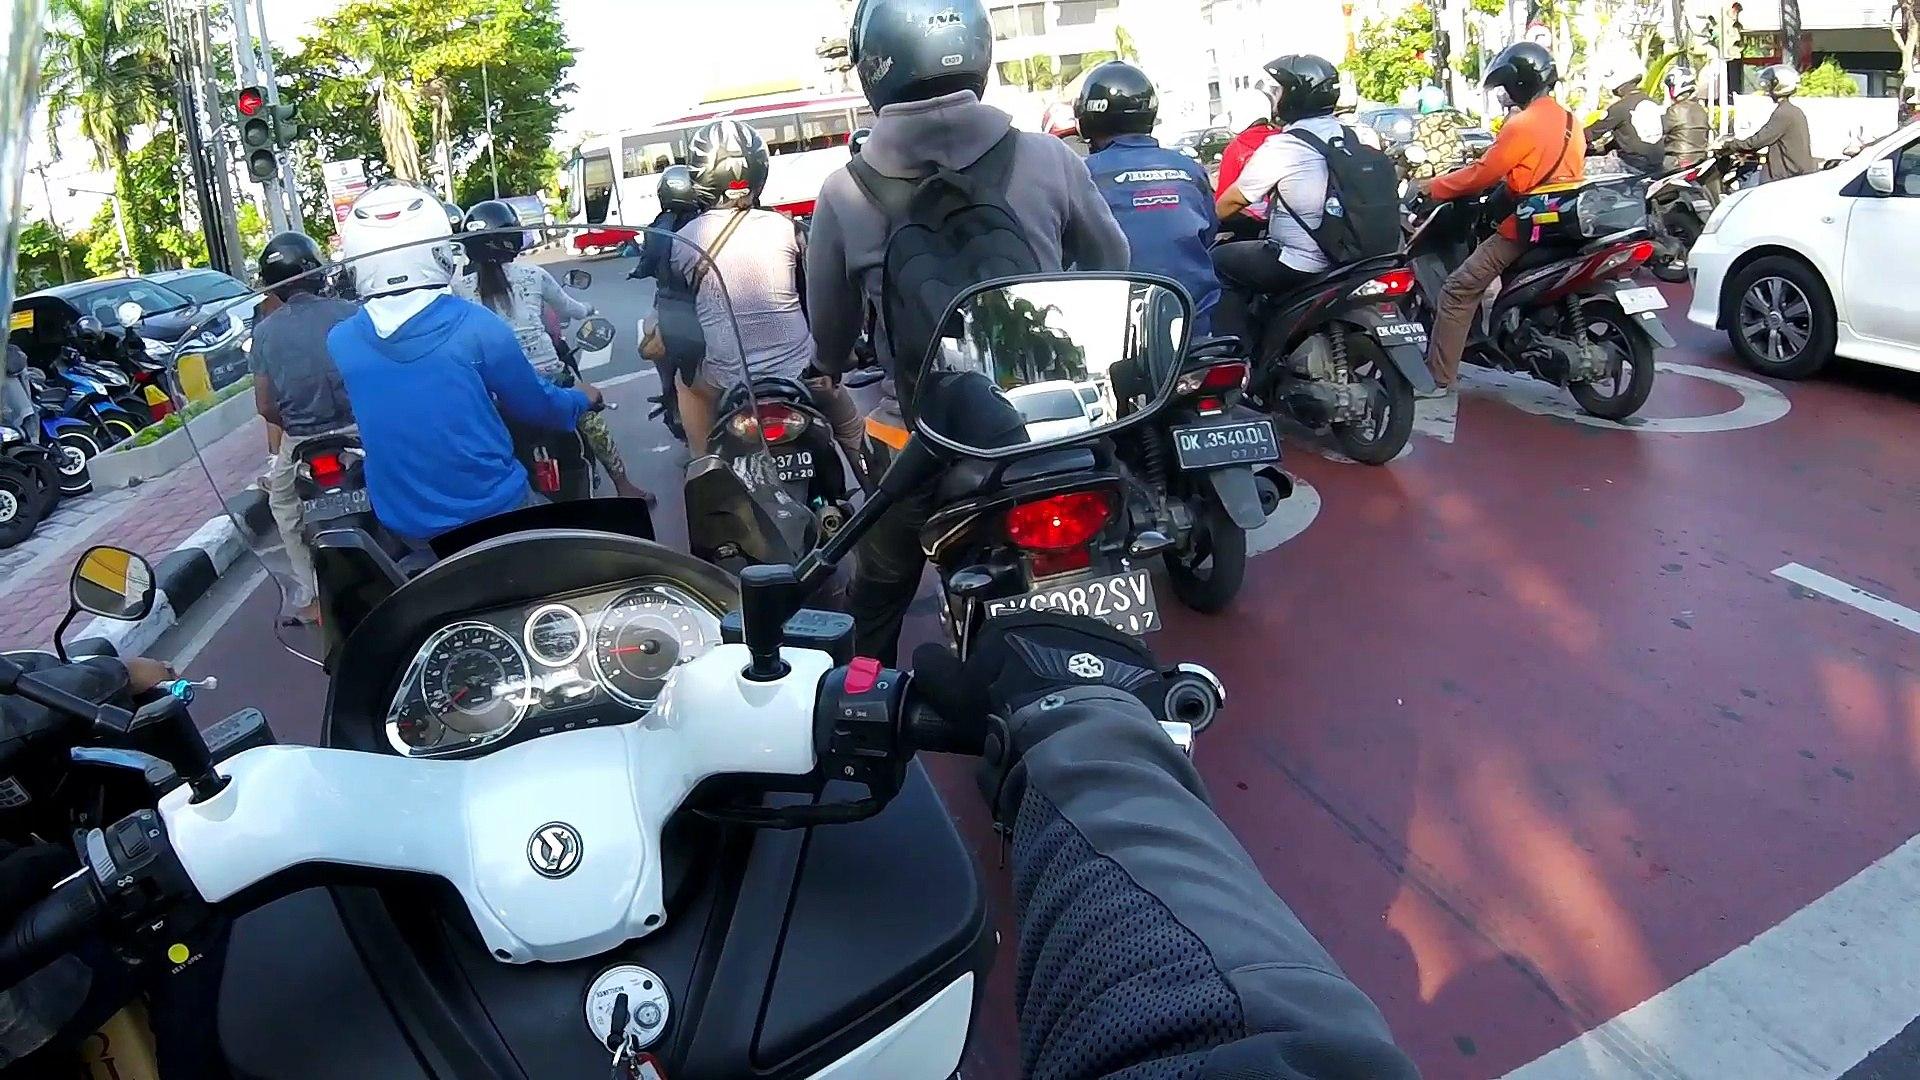 Motovlog Indonesia Test drive SYM MaxSym 400i Bali Balo Motor, The luxury riding lounge